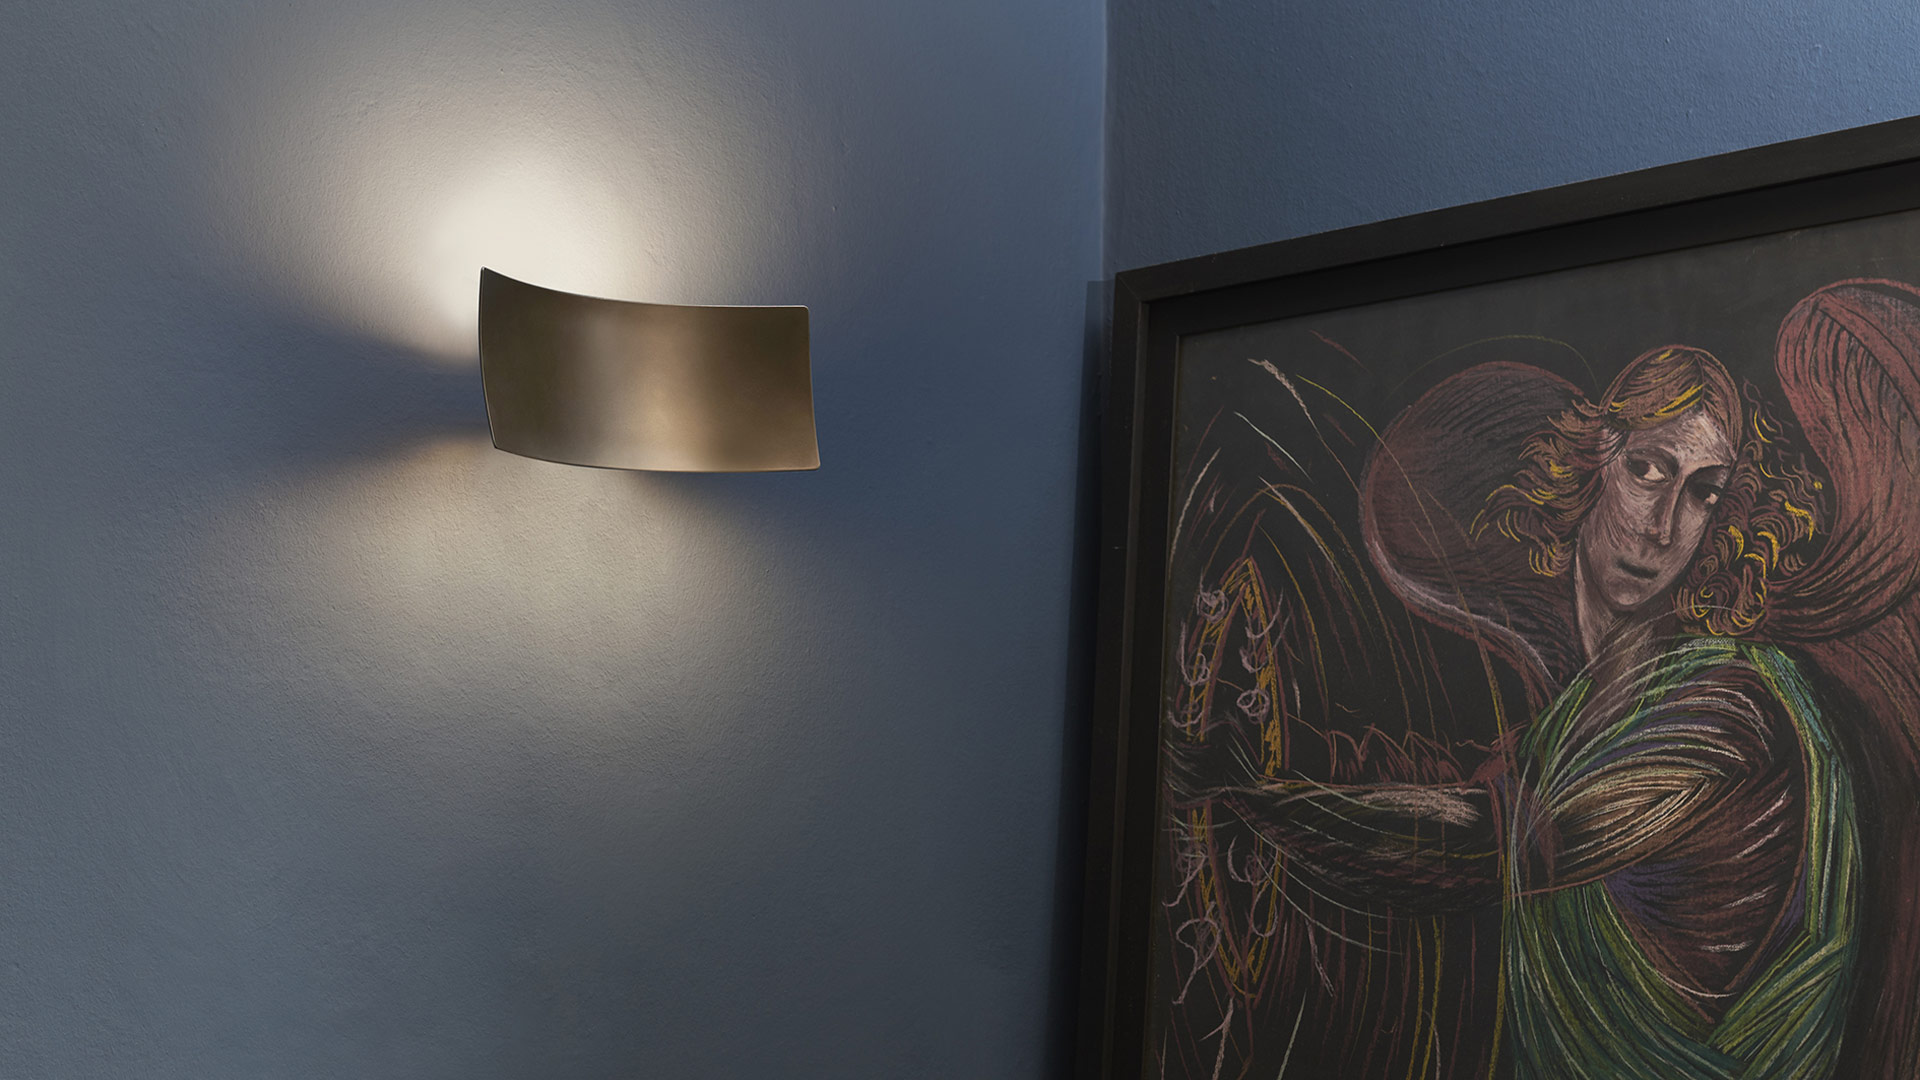 Lampade da parete, installazioni di luce